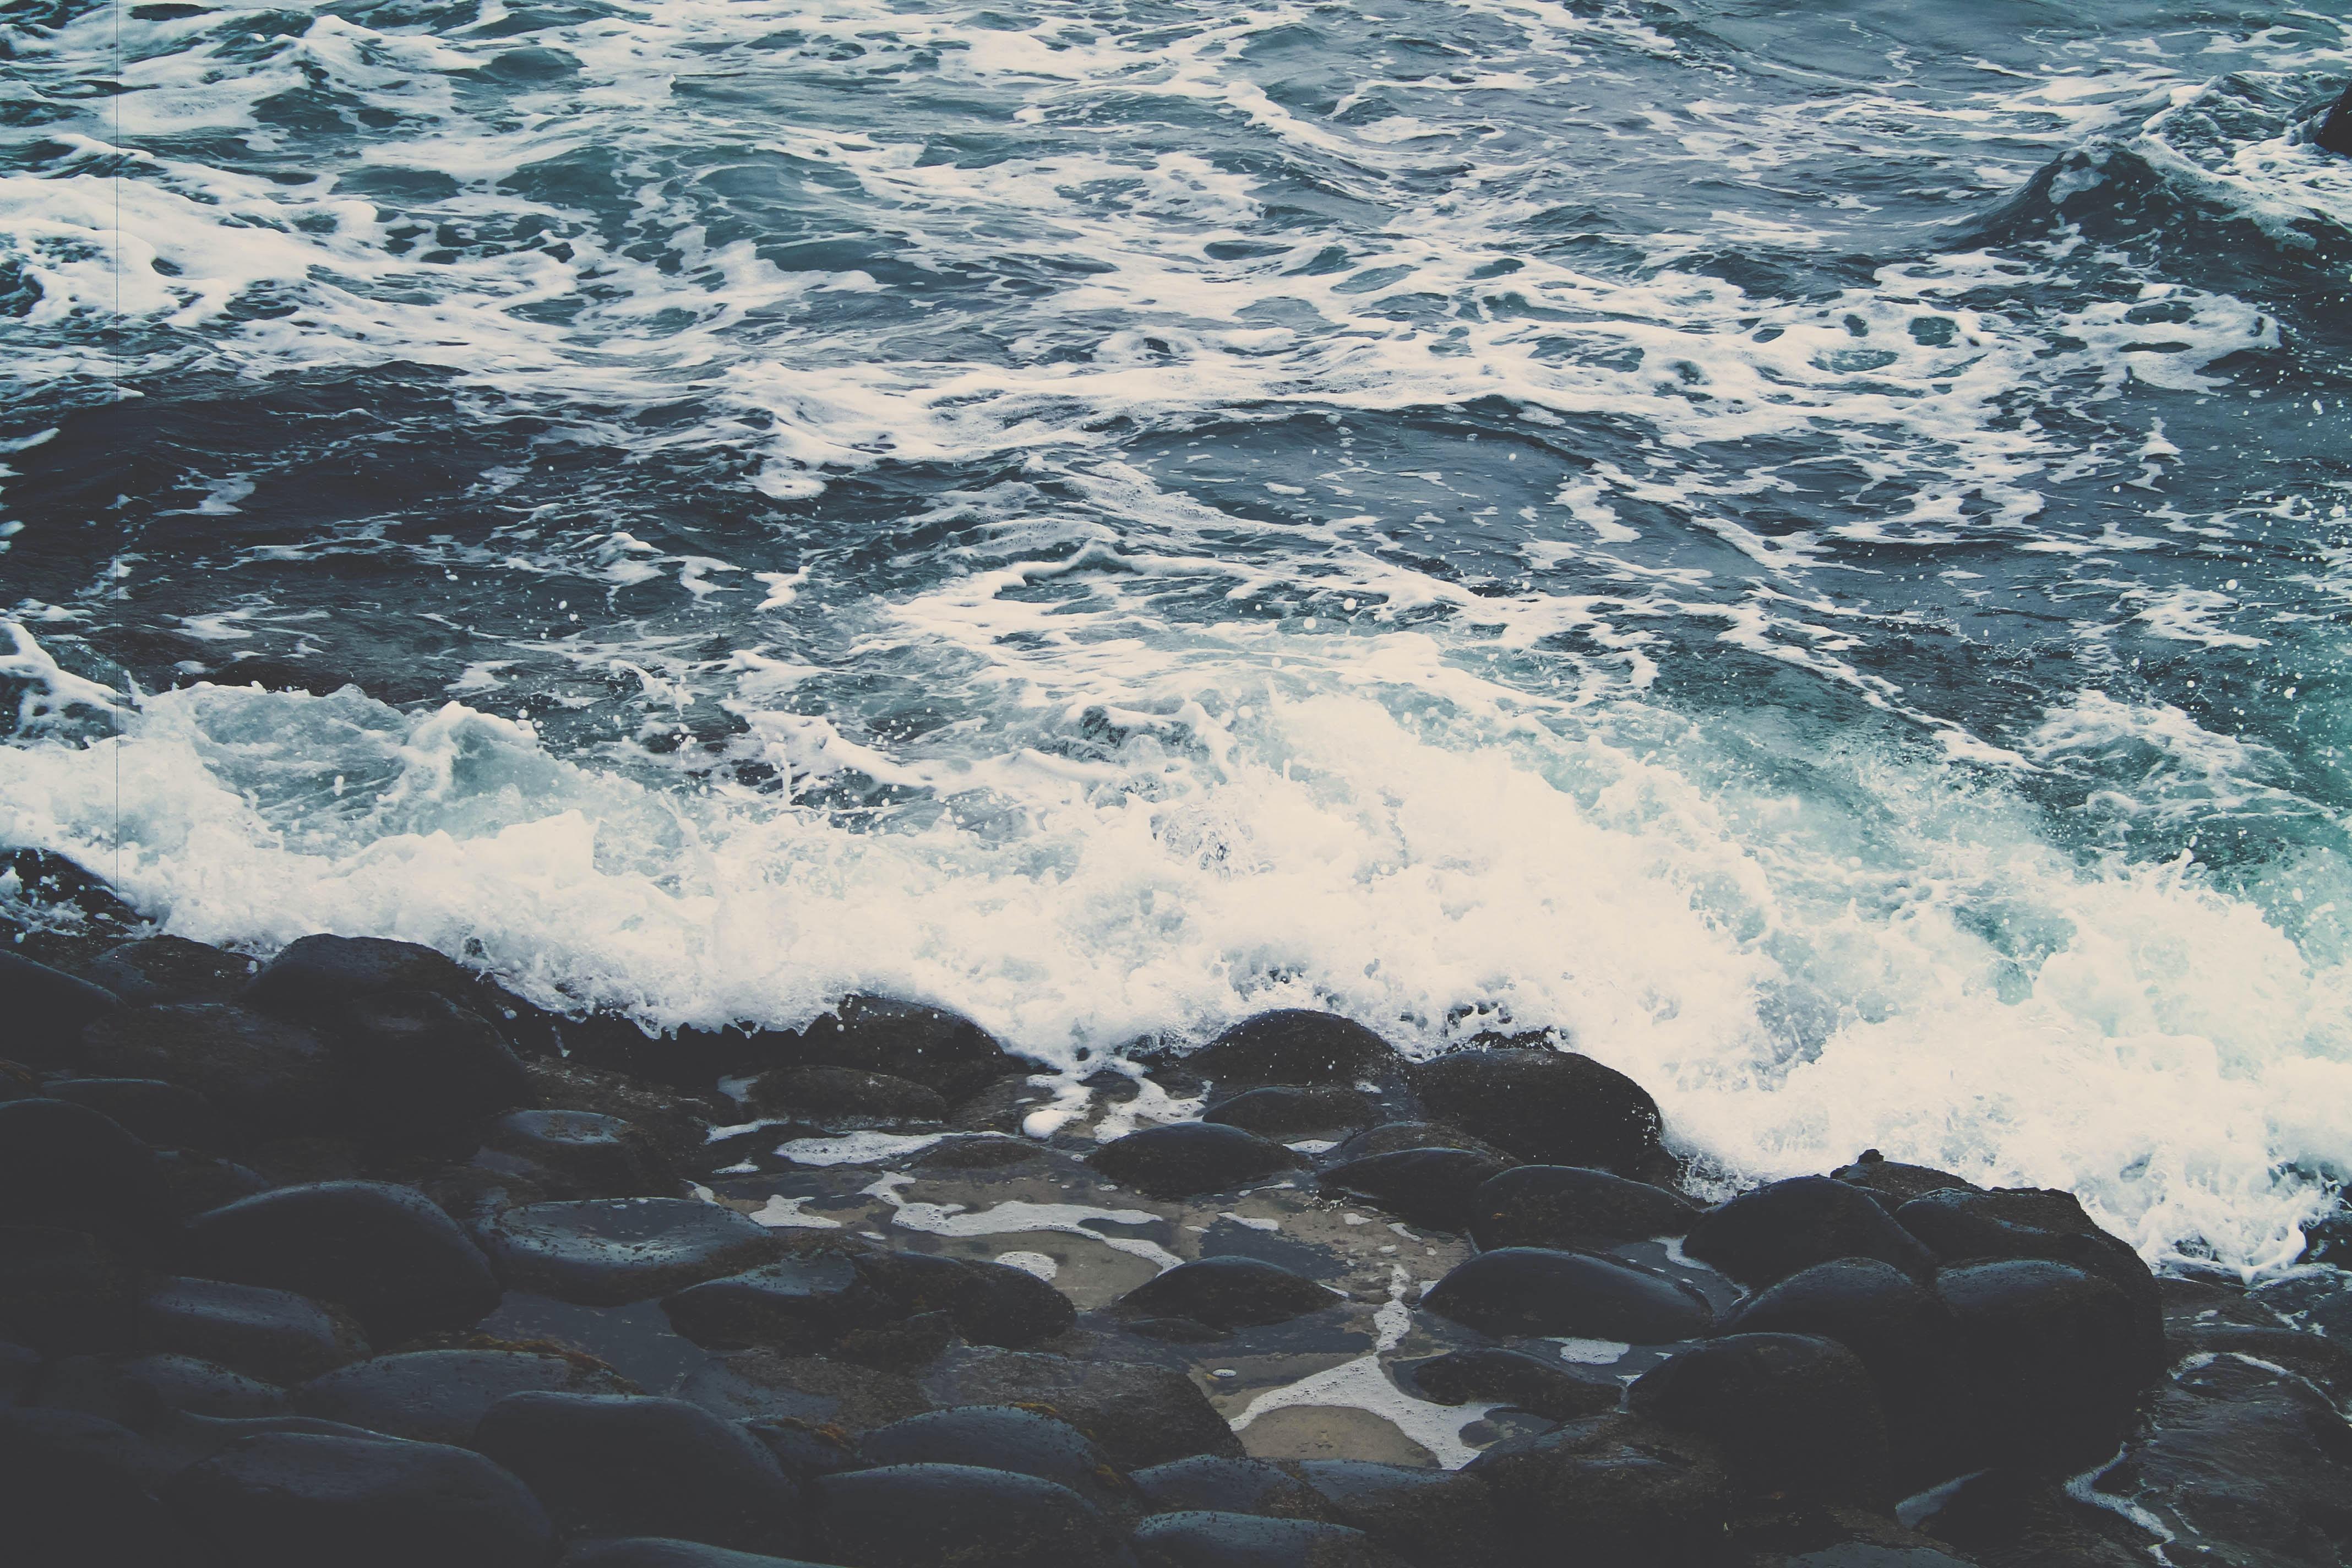 sea waves splashing through stone